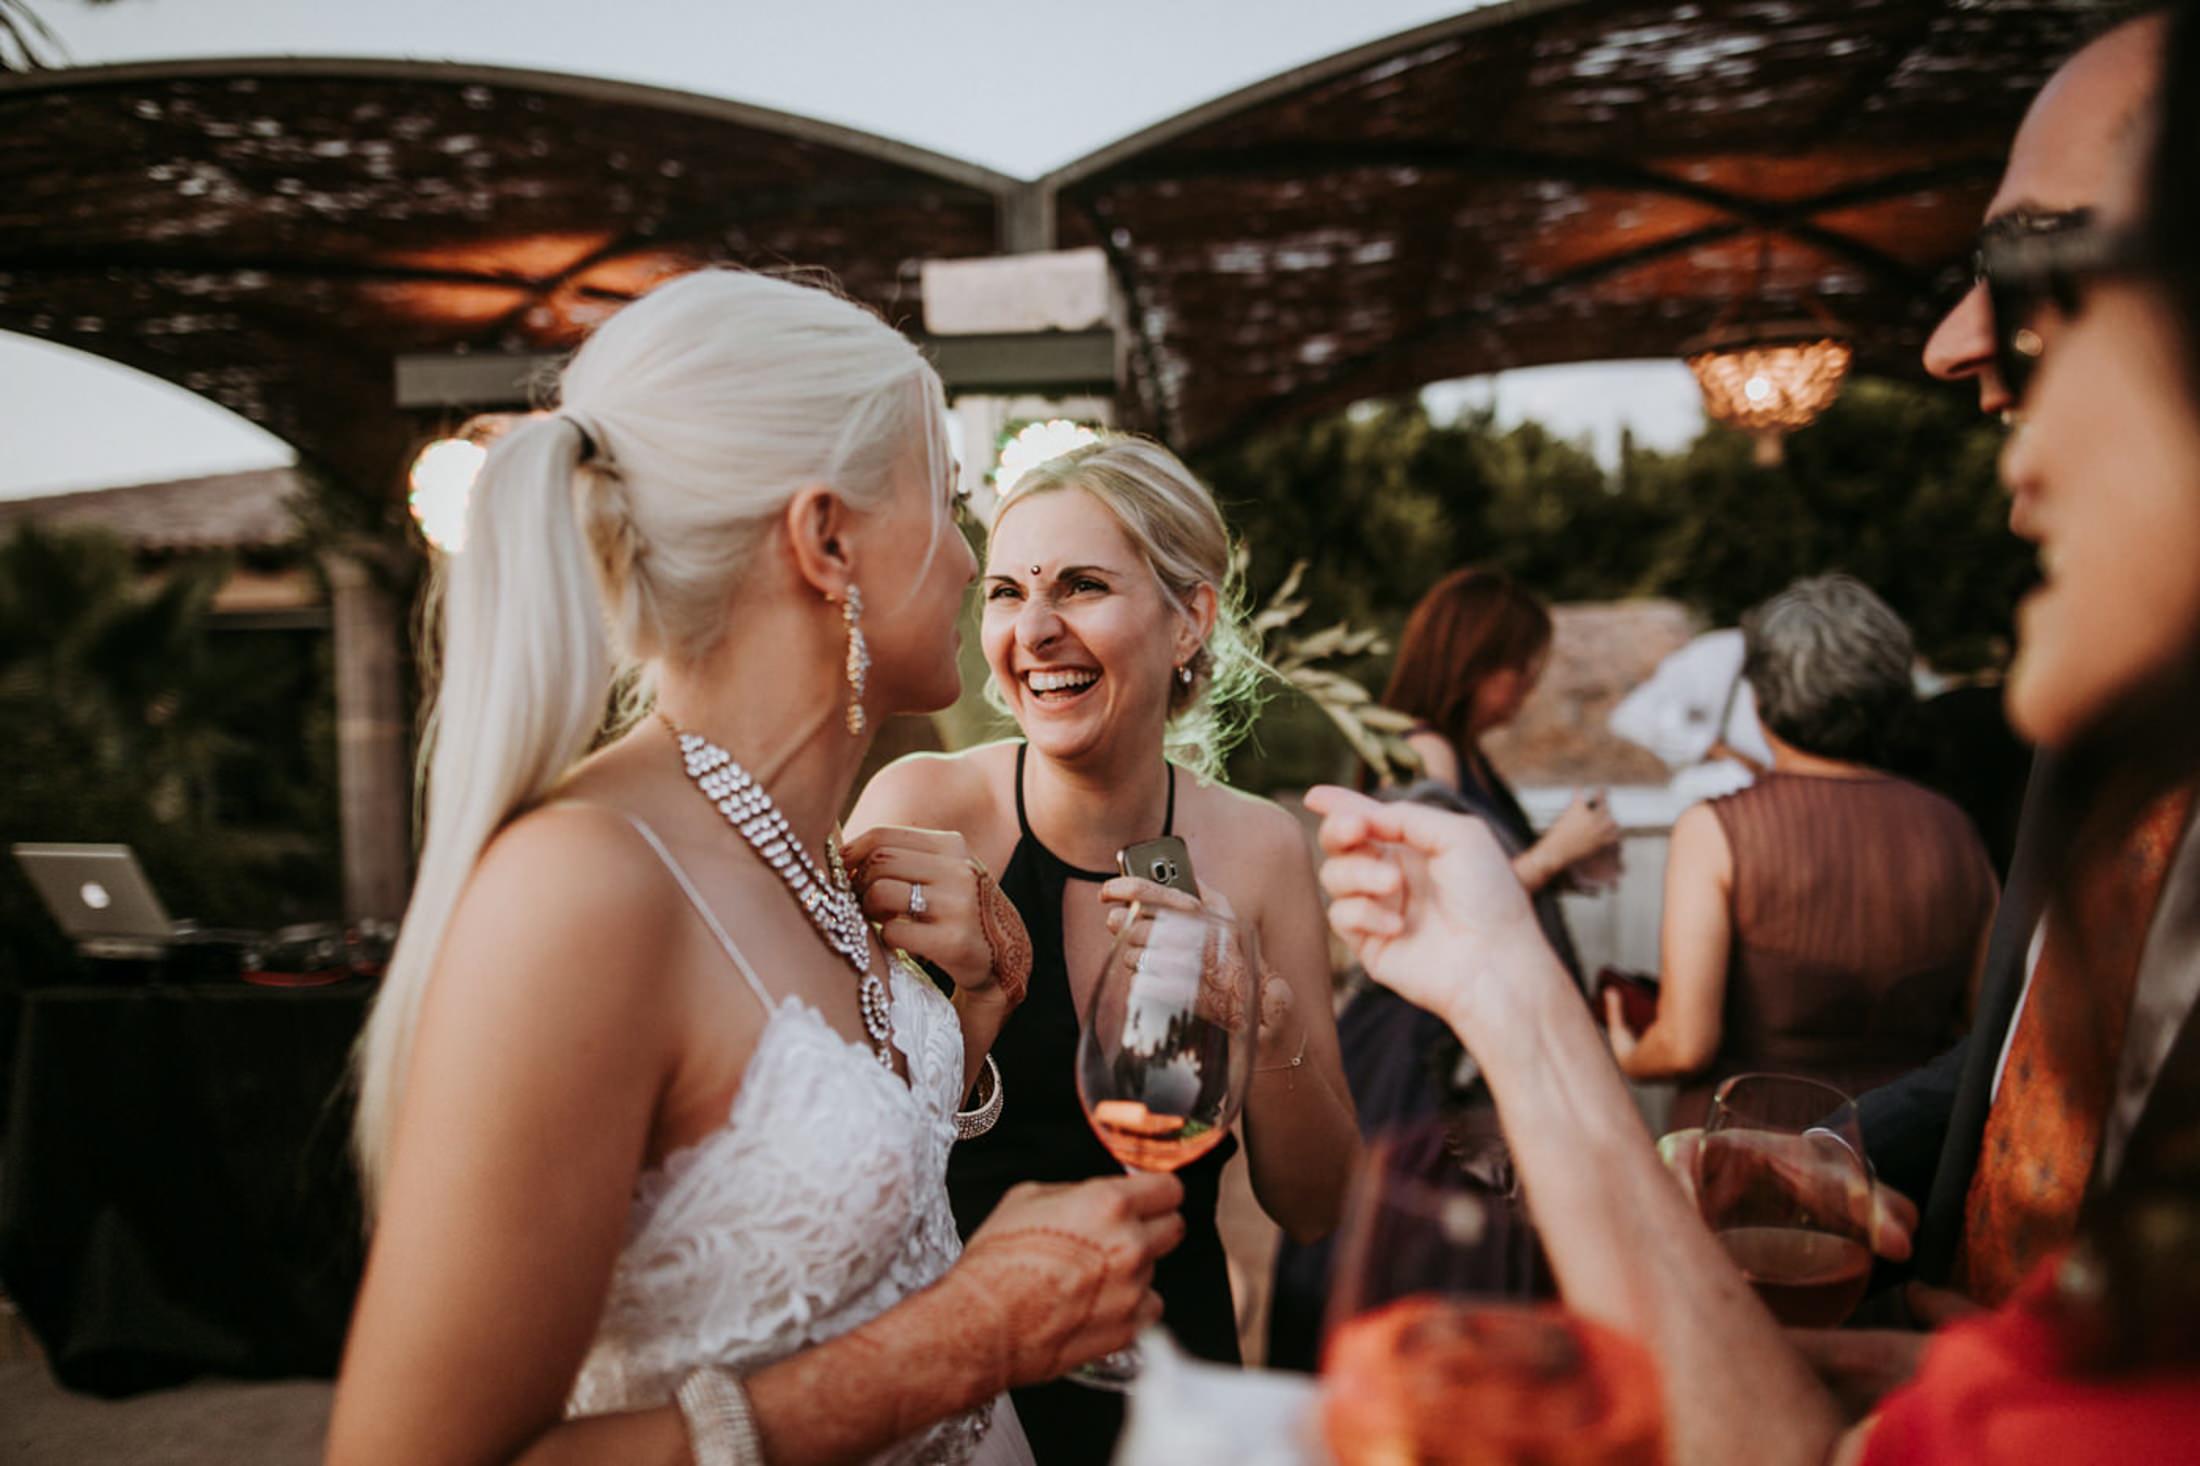 Wedding_Photographer_Mallorca_Daniela-Marquardt_Photography_New_York_Iceland_Tuscany_Santorini_Portugal_Austria_Bavaria_Elopement_Hochzeitsfotograf_AntjeRajat2_103